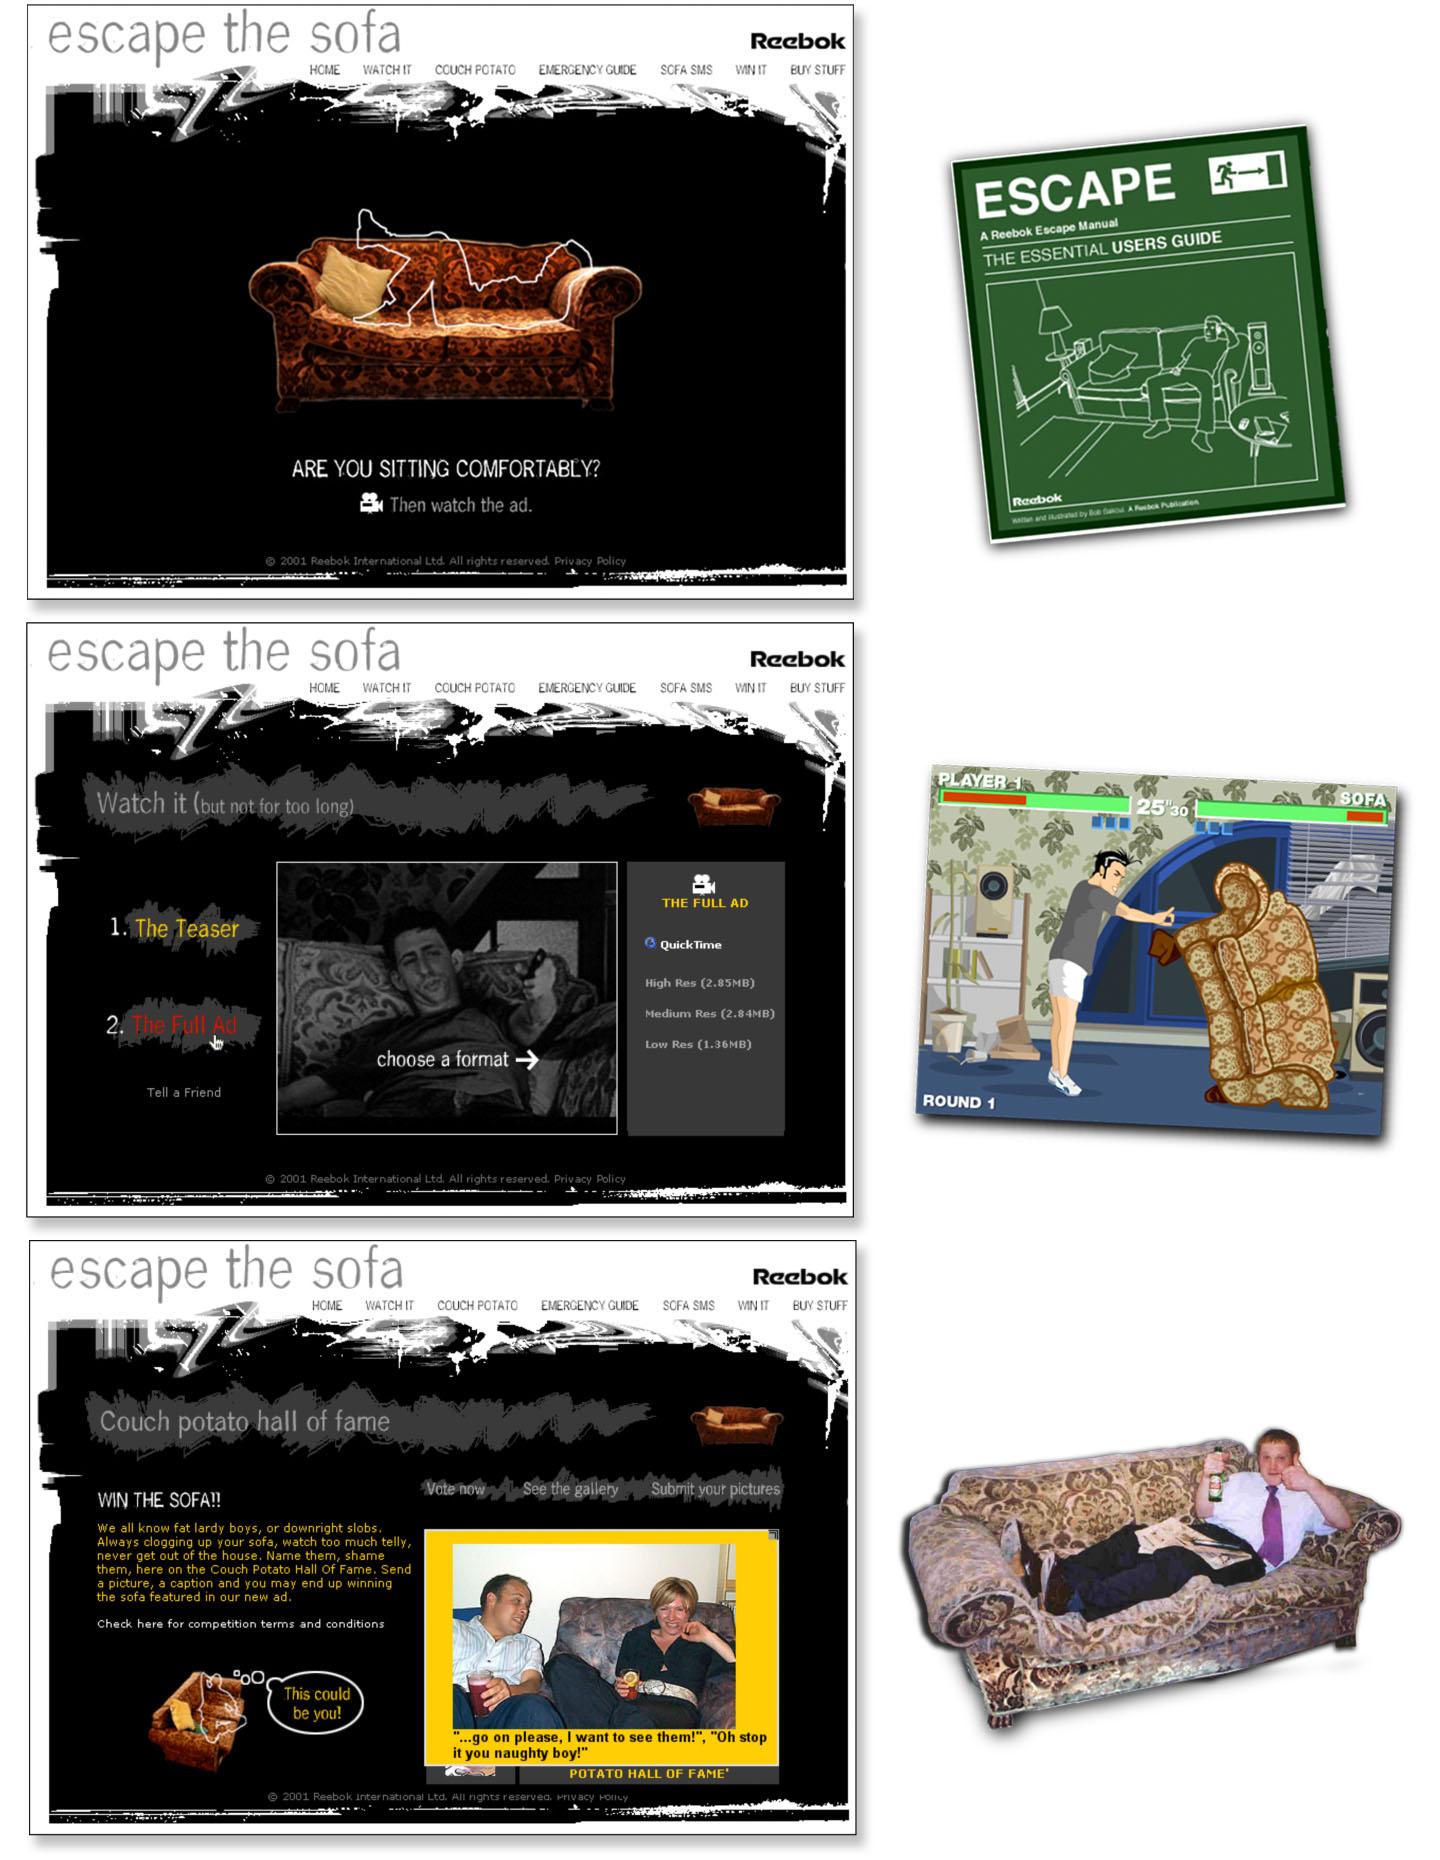 02 - Reebok Sofa Project